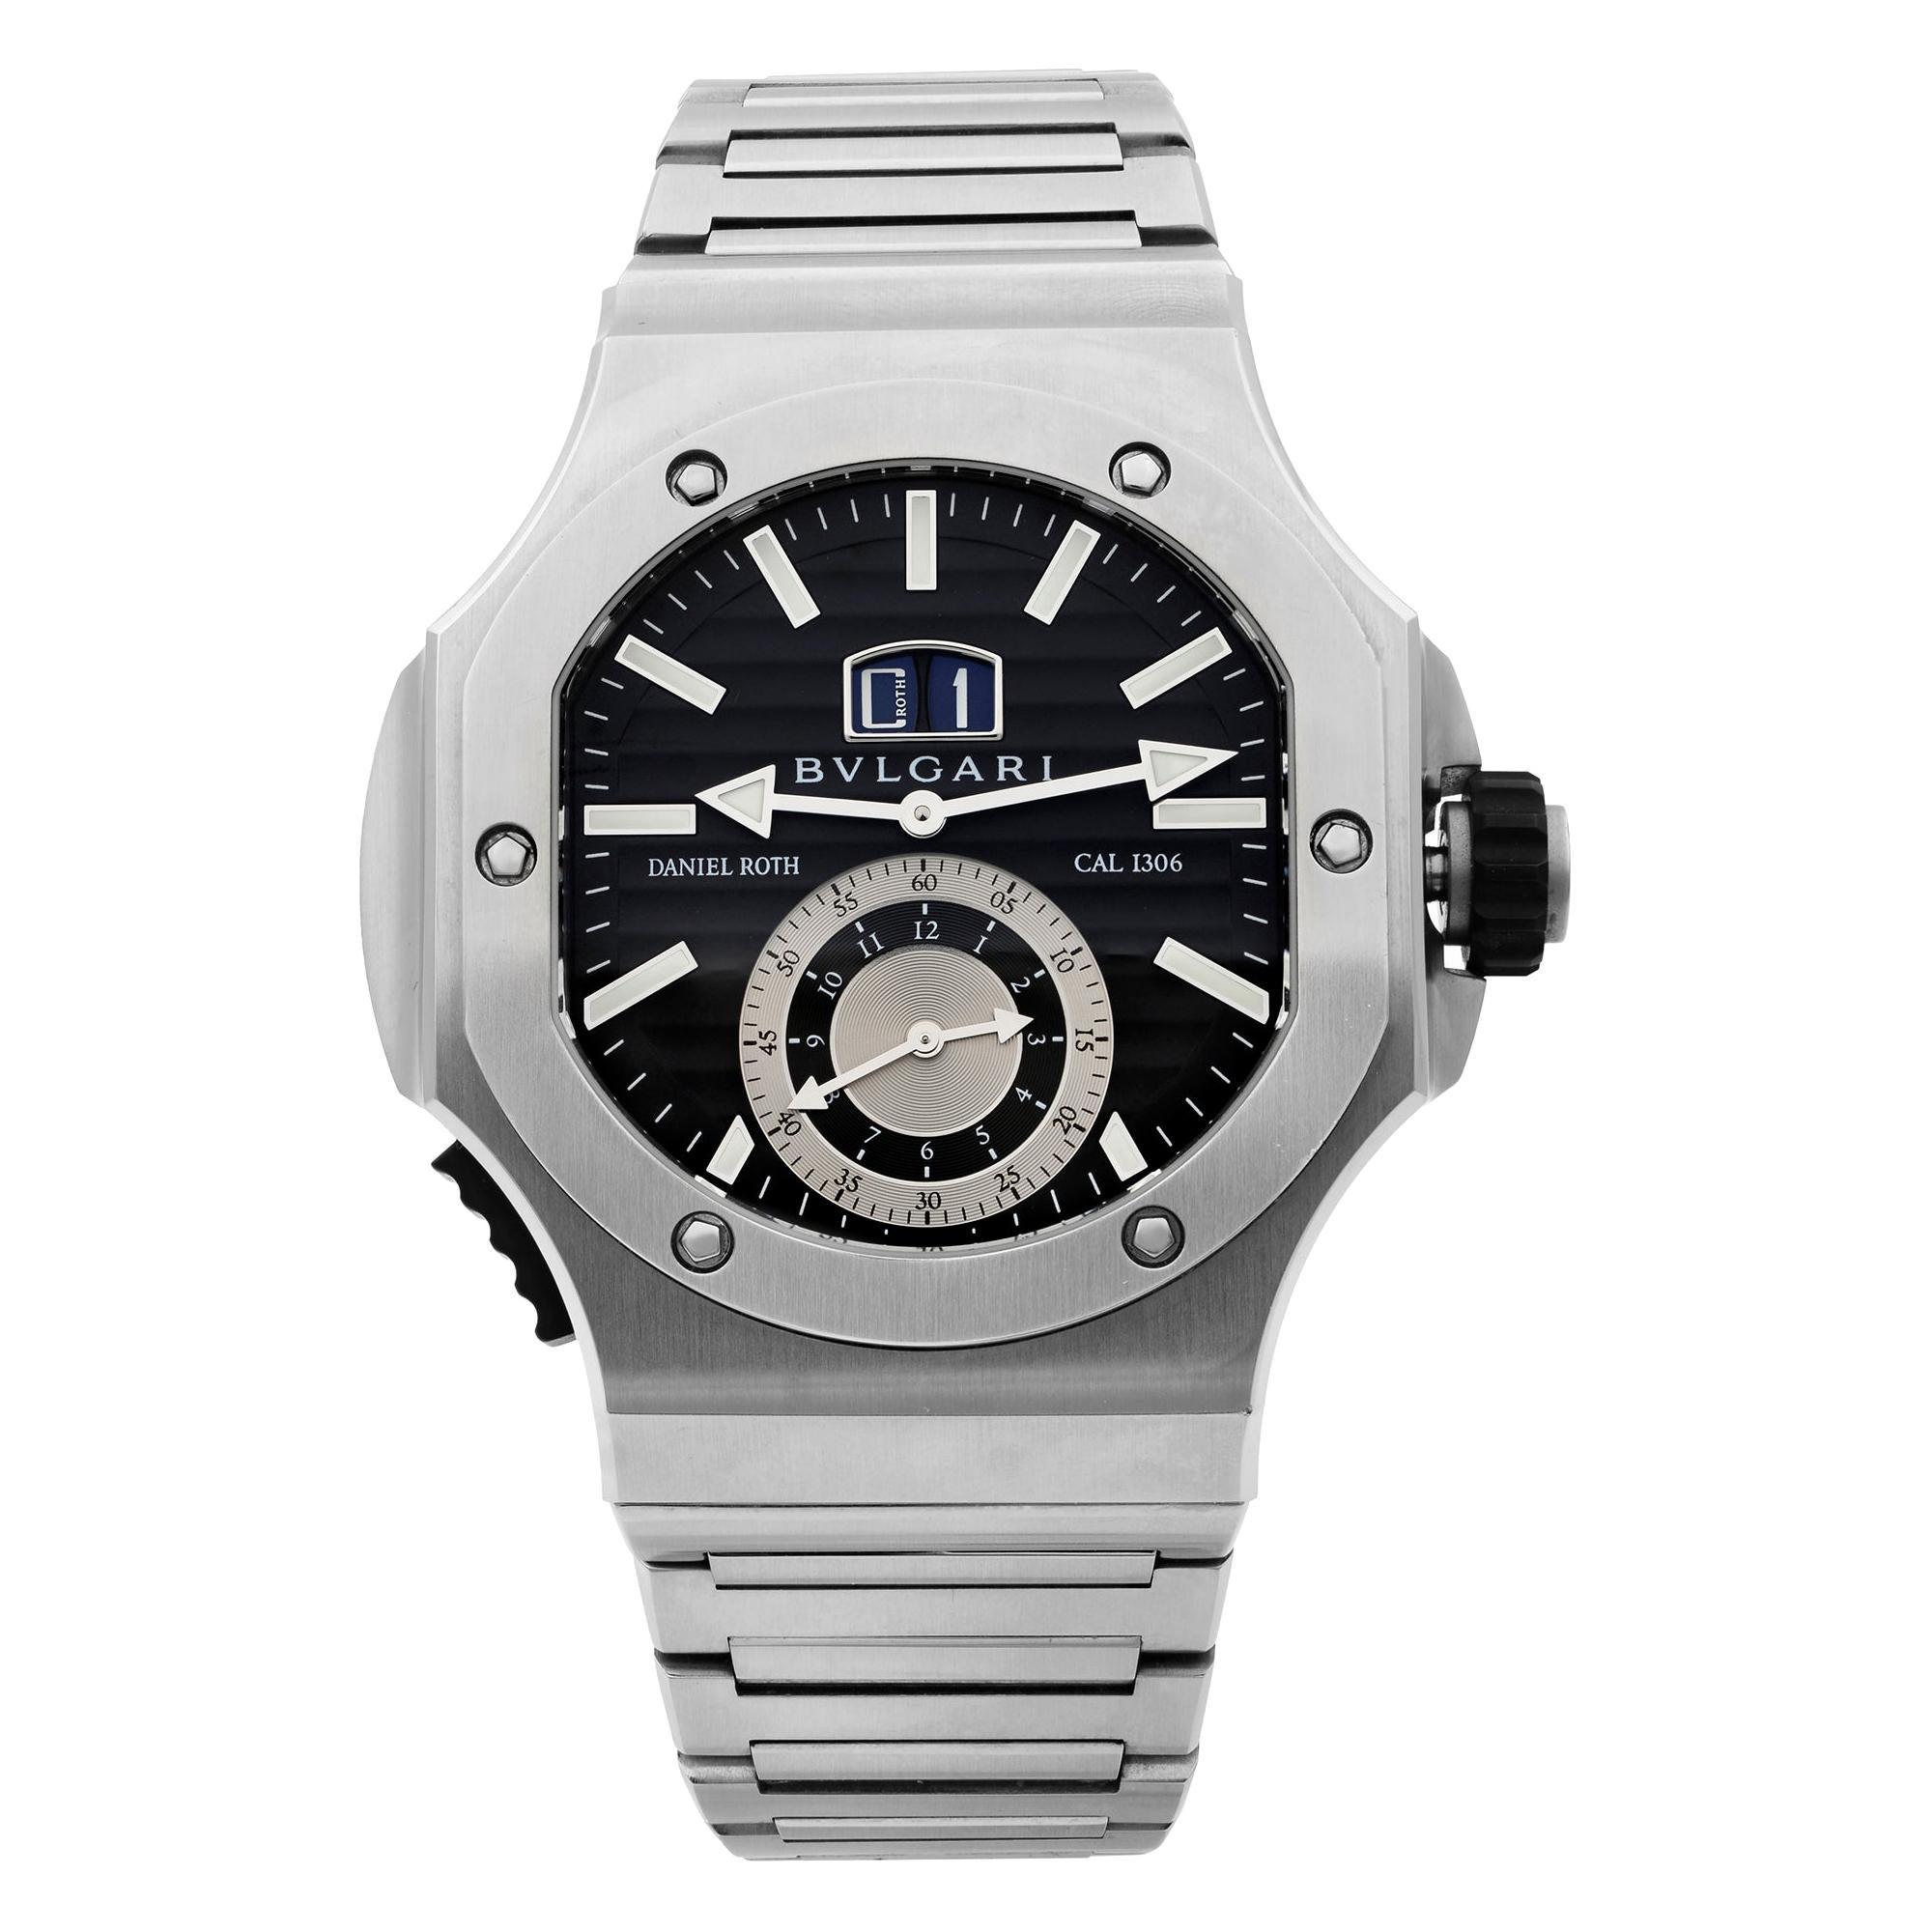 Bvlgari Endurer Chronosprint Daniel Roth Black Dial Automatic Men's Watch 101877